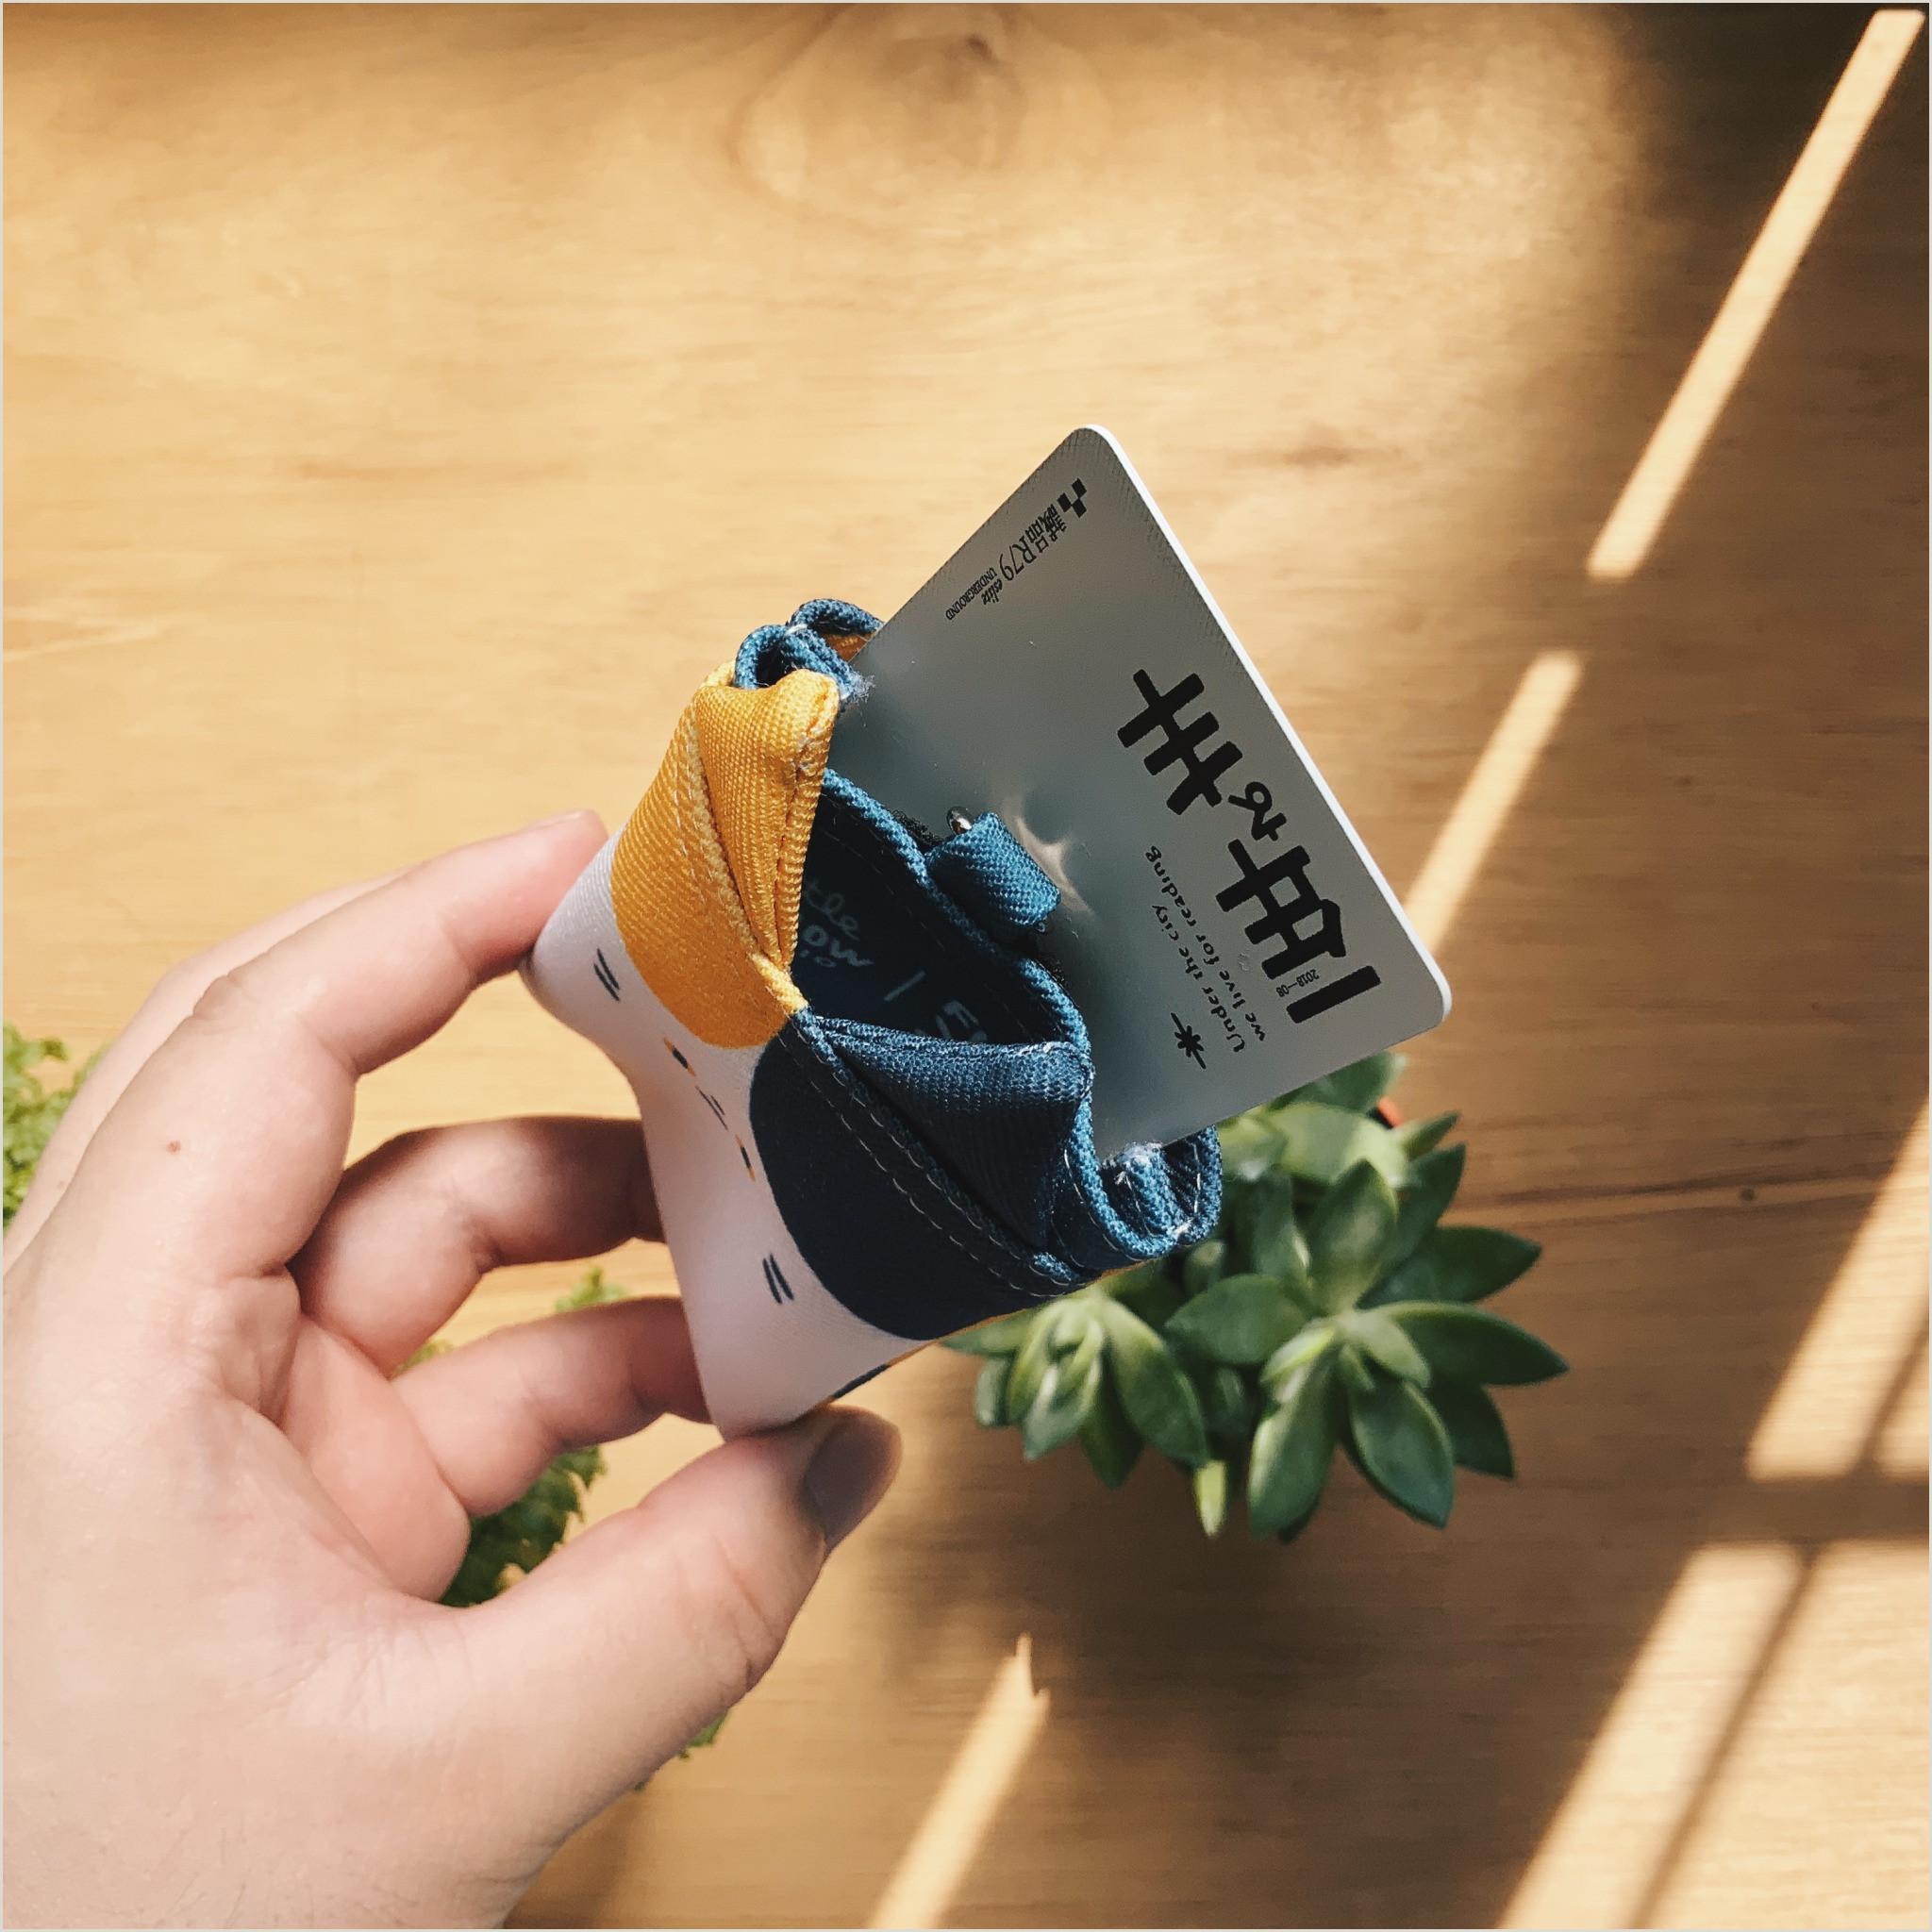 Business Cards Back Id Card Holder & Lanyard Tortoiseshell Cat